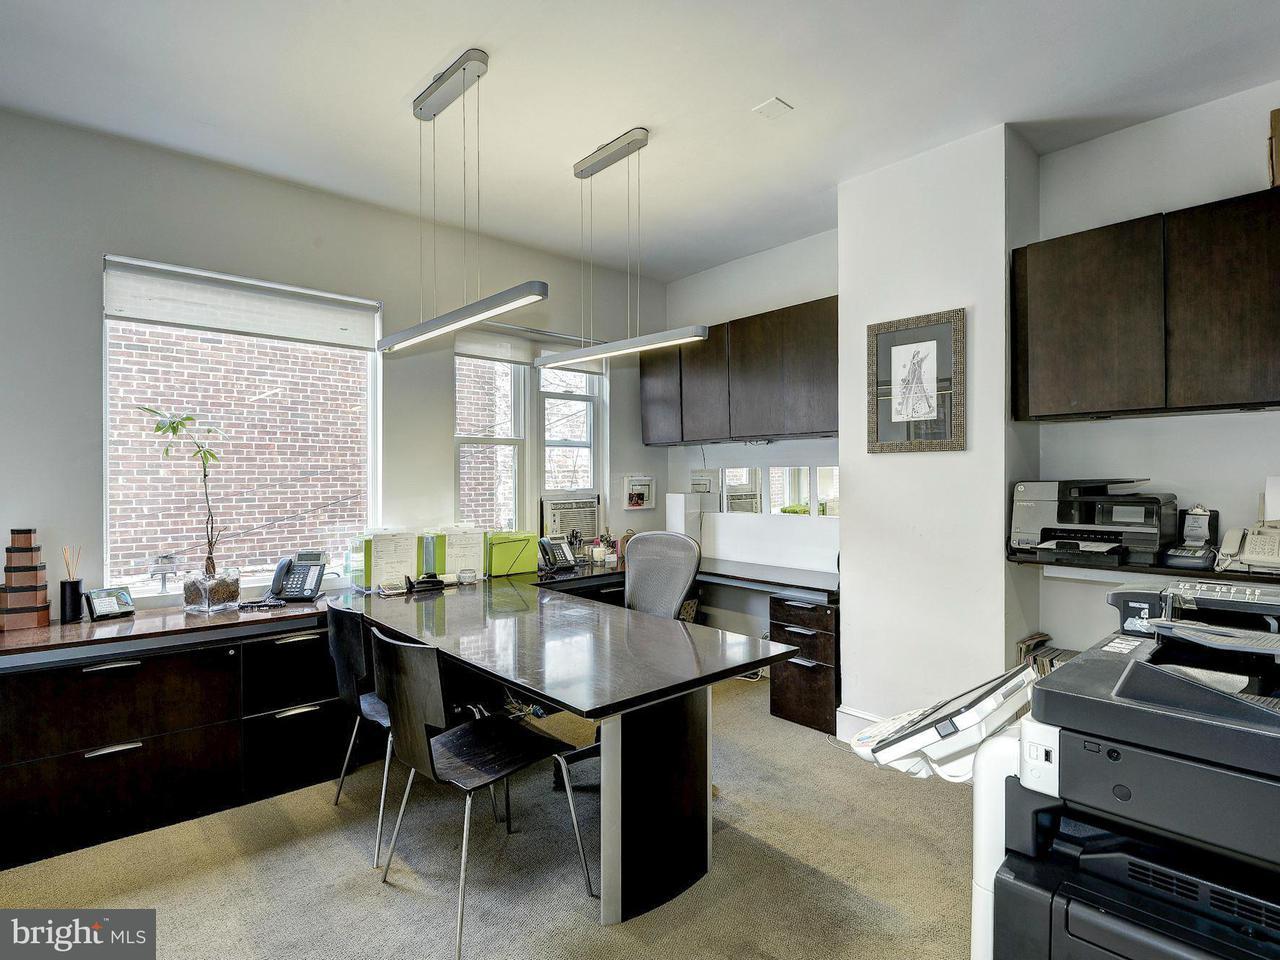 Additional photo for property listing at 1207 POTOMAC ST NW 1207 POTOMAC ST NW Washington, コロンビア特別区 20007 アメリカ合衆国